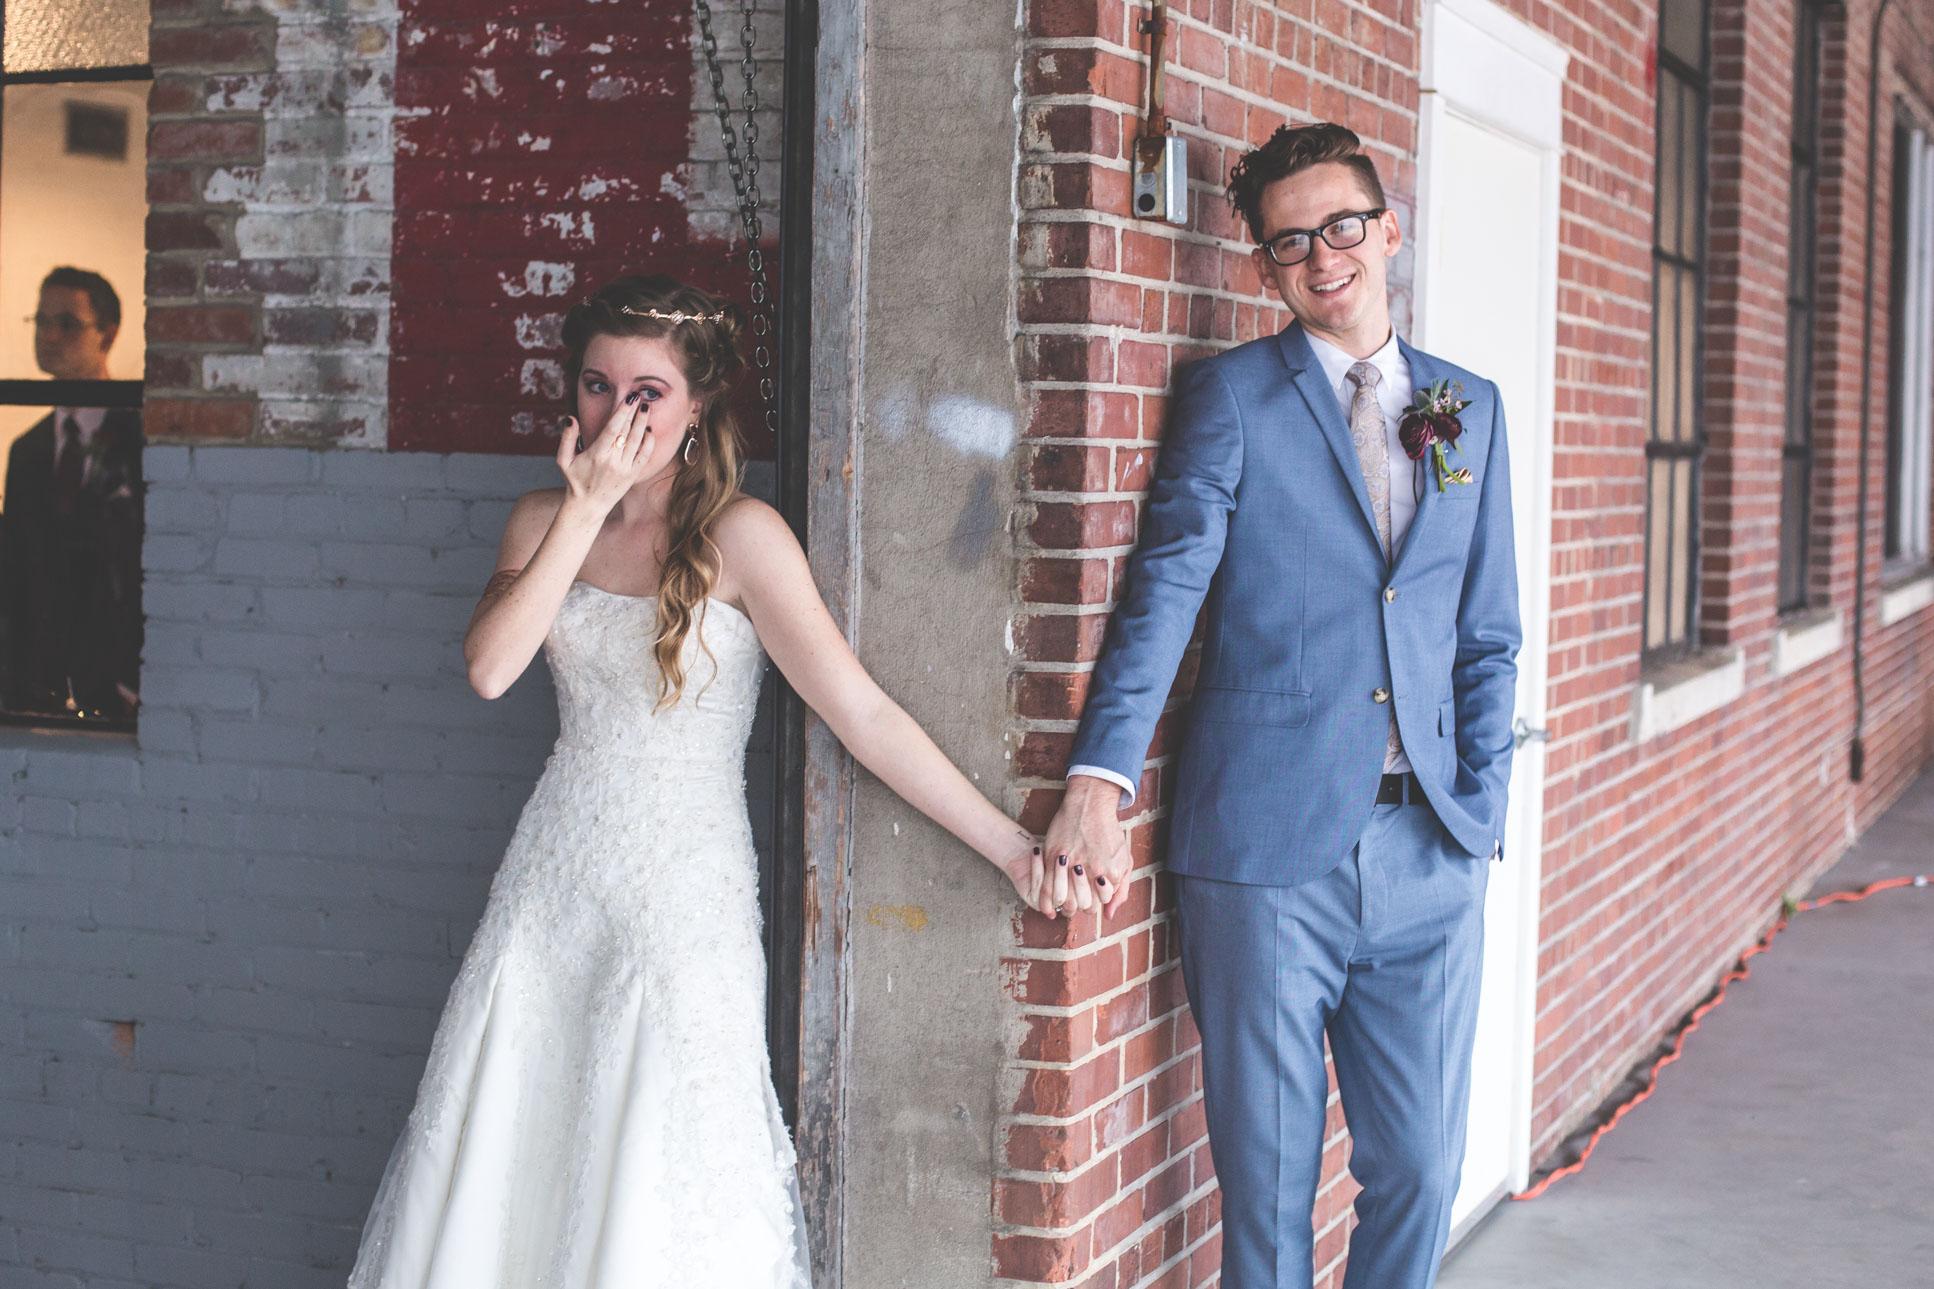 Adam-Szrmack-The-Glass-Factory-Wedding-88.jpg